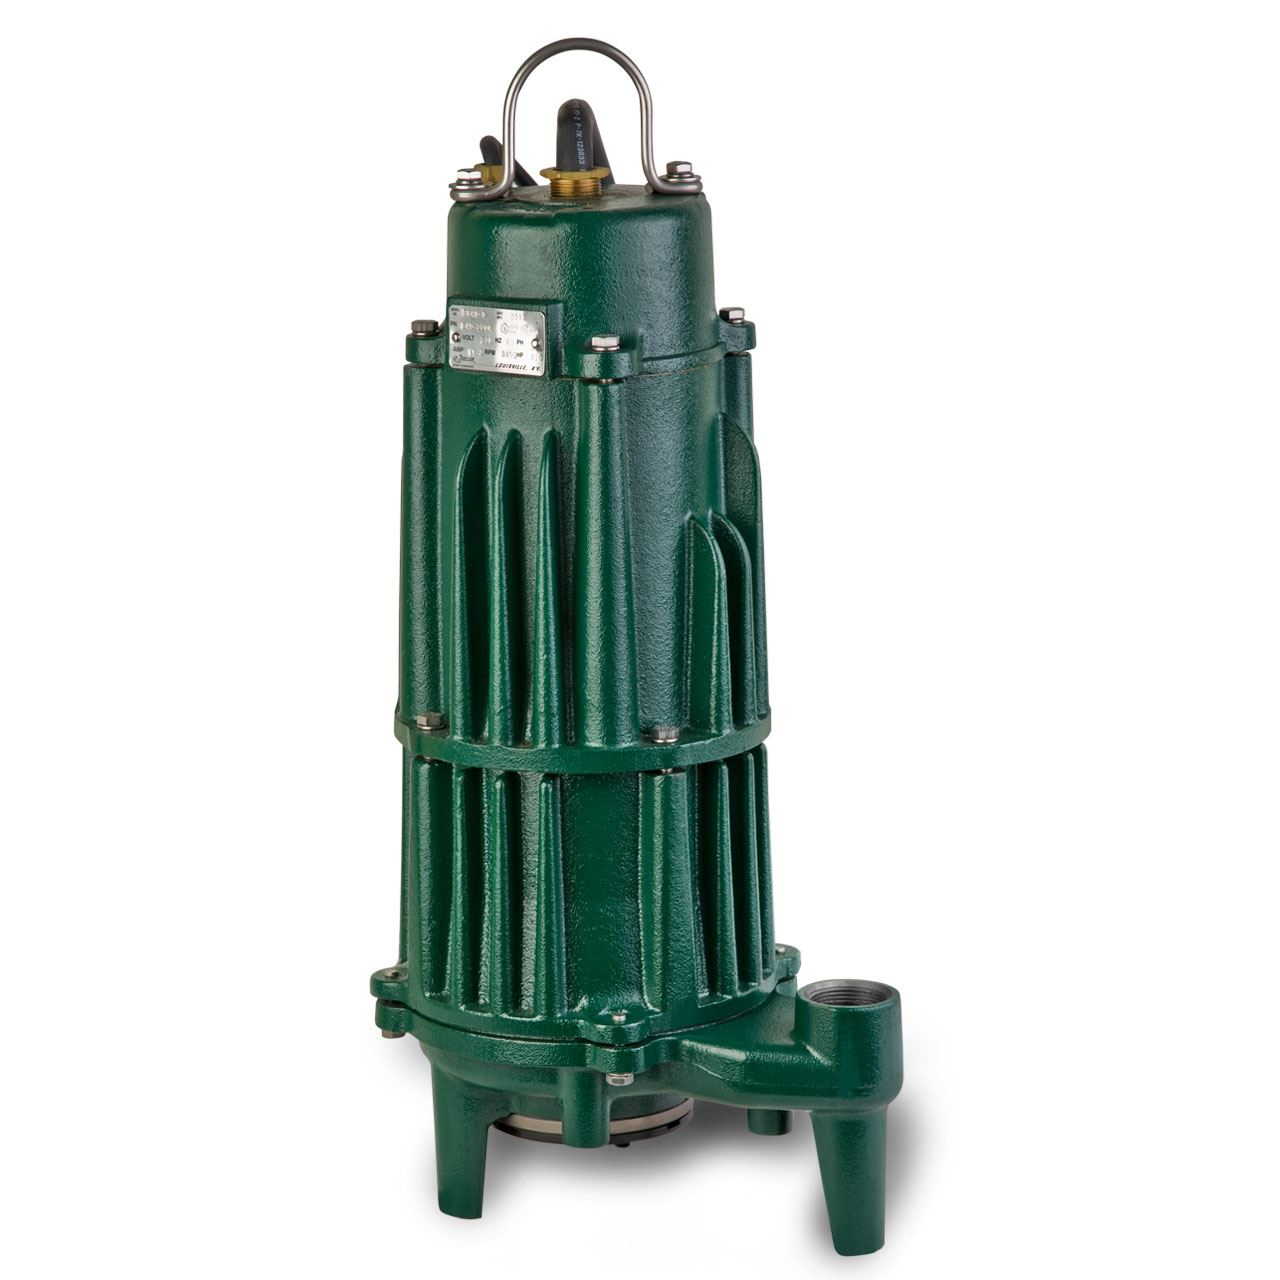 zoeller duplex pump control panel wiring diagram baldor single phase 230v motor 840 0008 model g840 shark auto reversing grinder 2 hp 460v